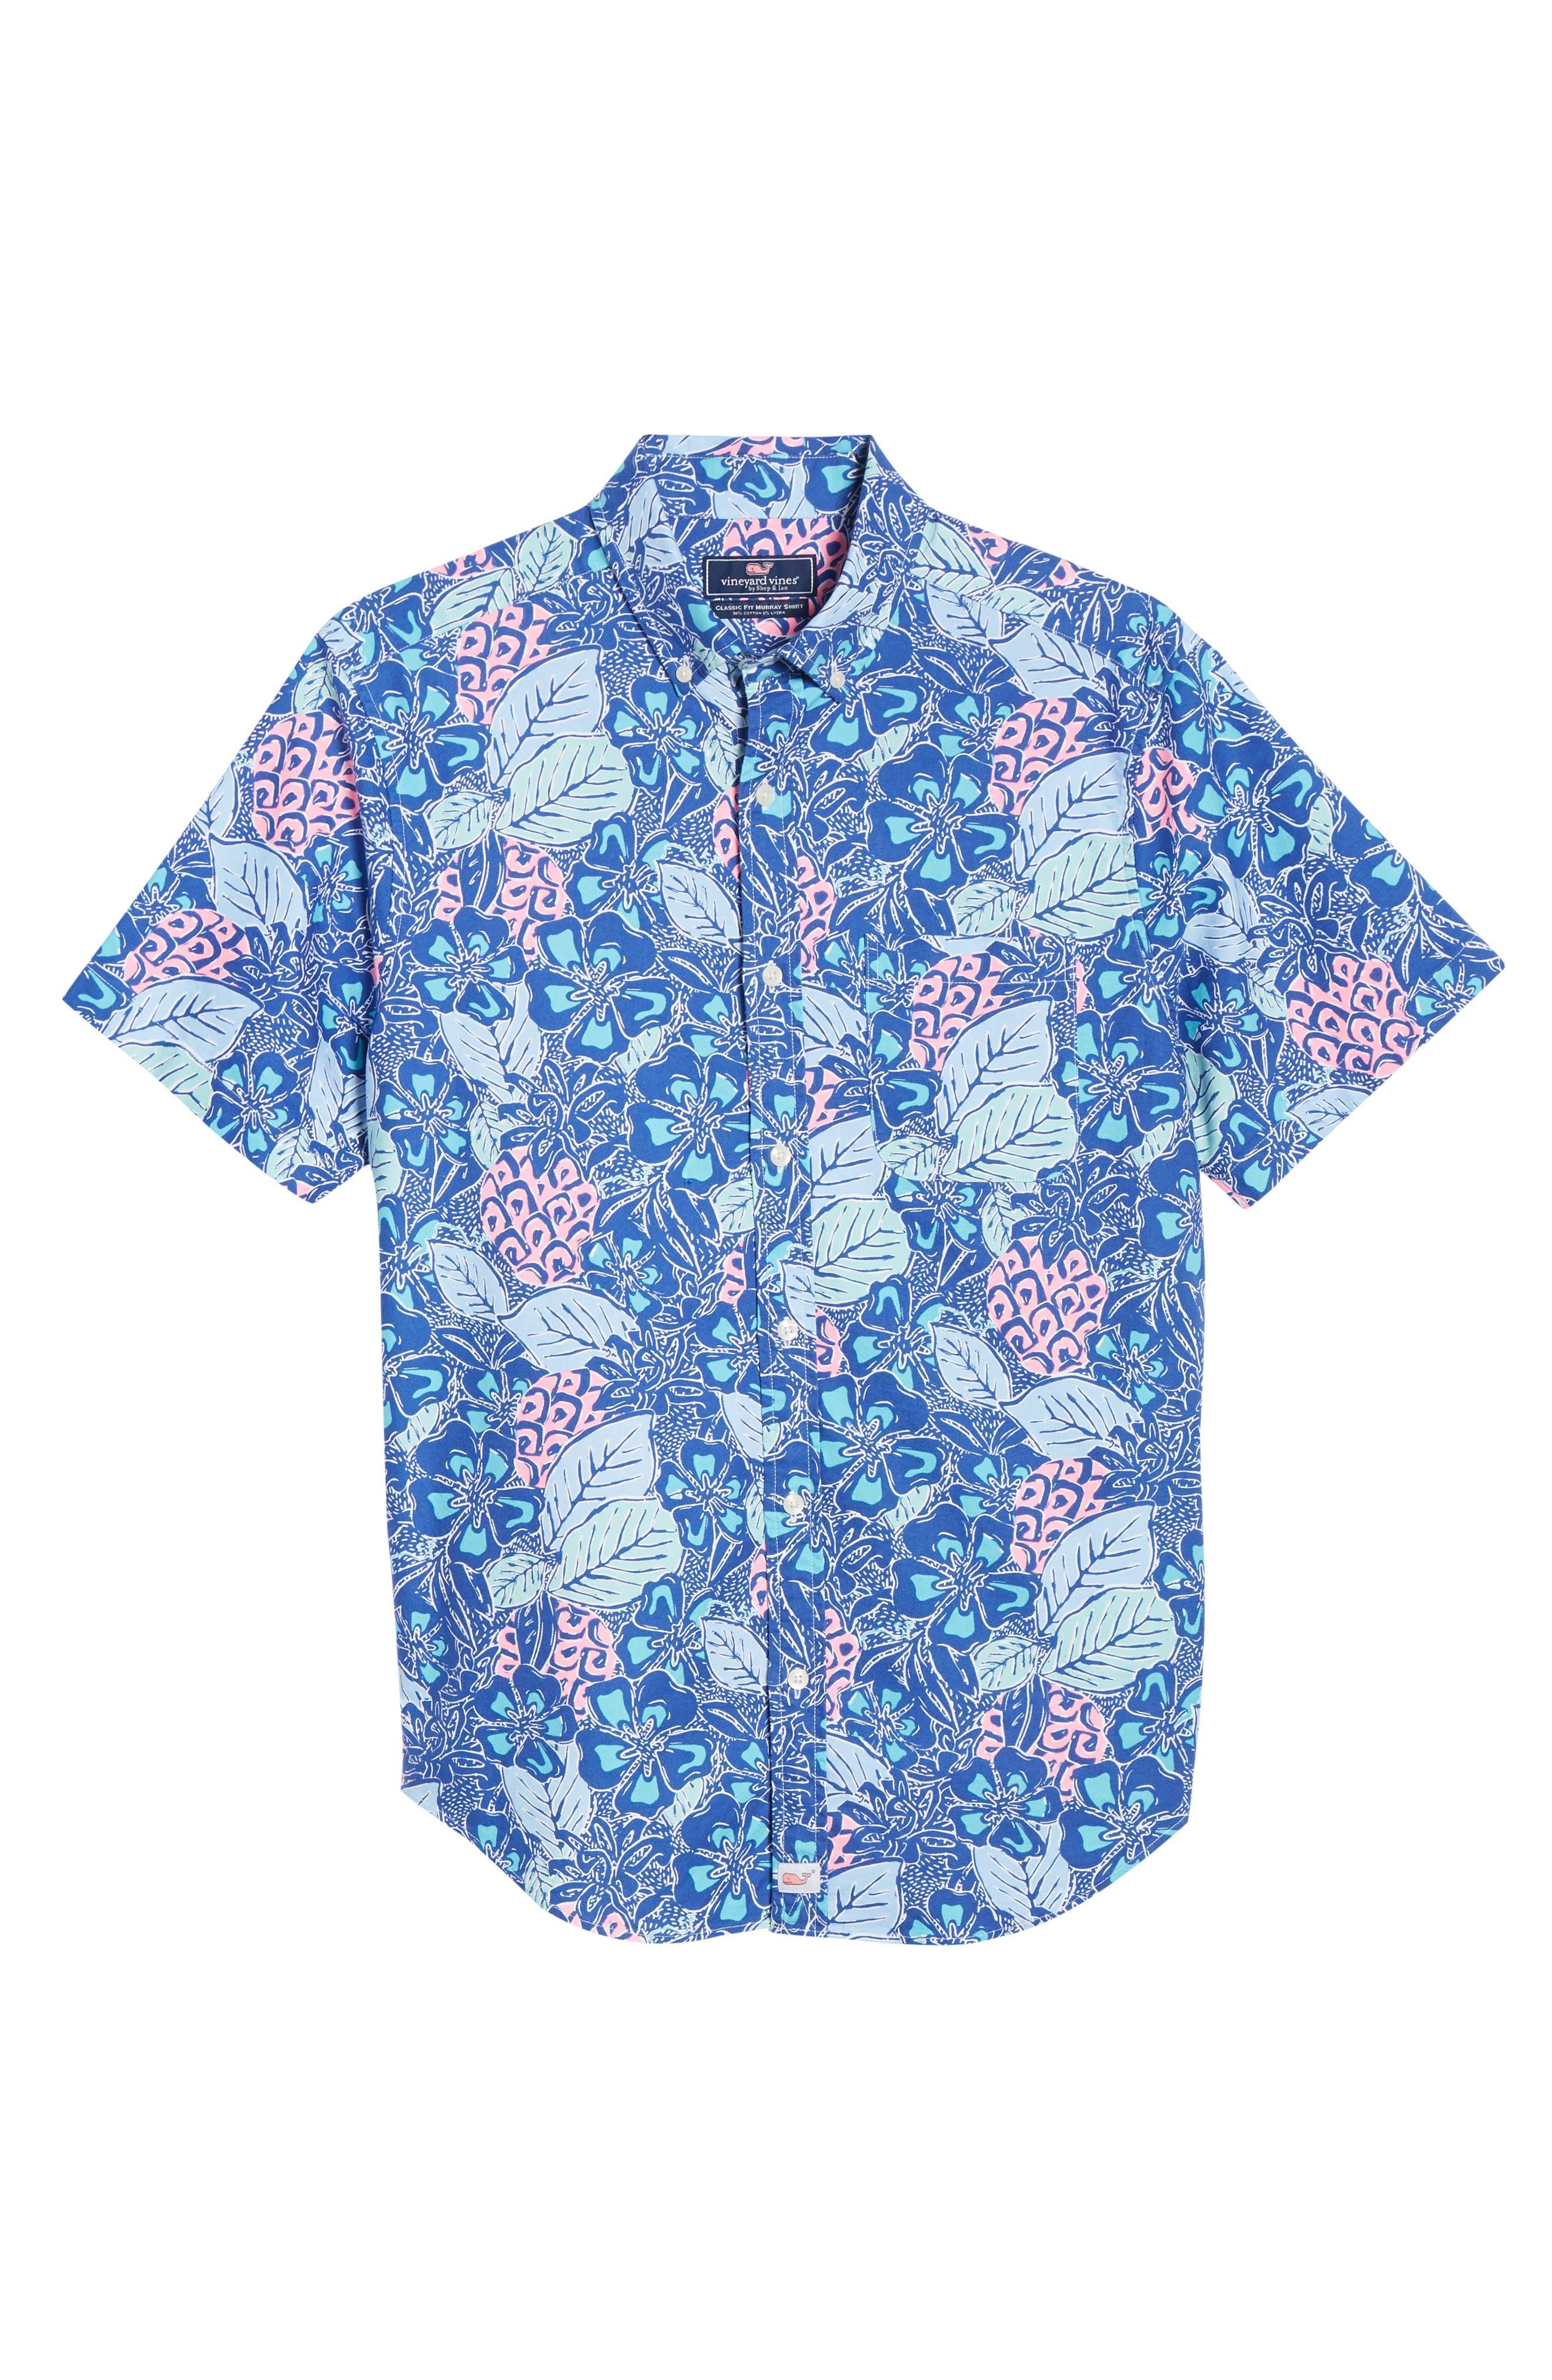 VINEYARD VINES,                             Murray Slim Fit Pineapple Print Sport Shirt,                             Alternate thumbnail 5, color,                             ROYAL OCEAN